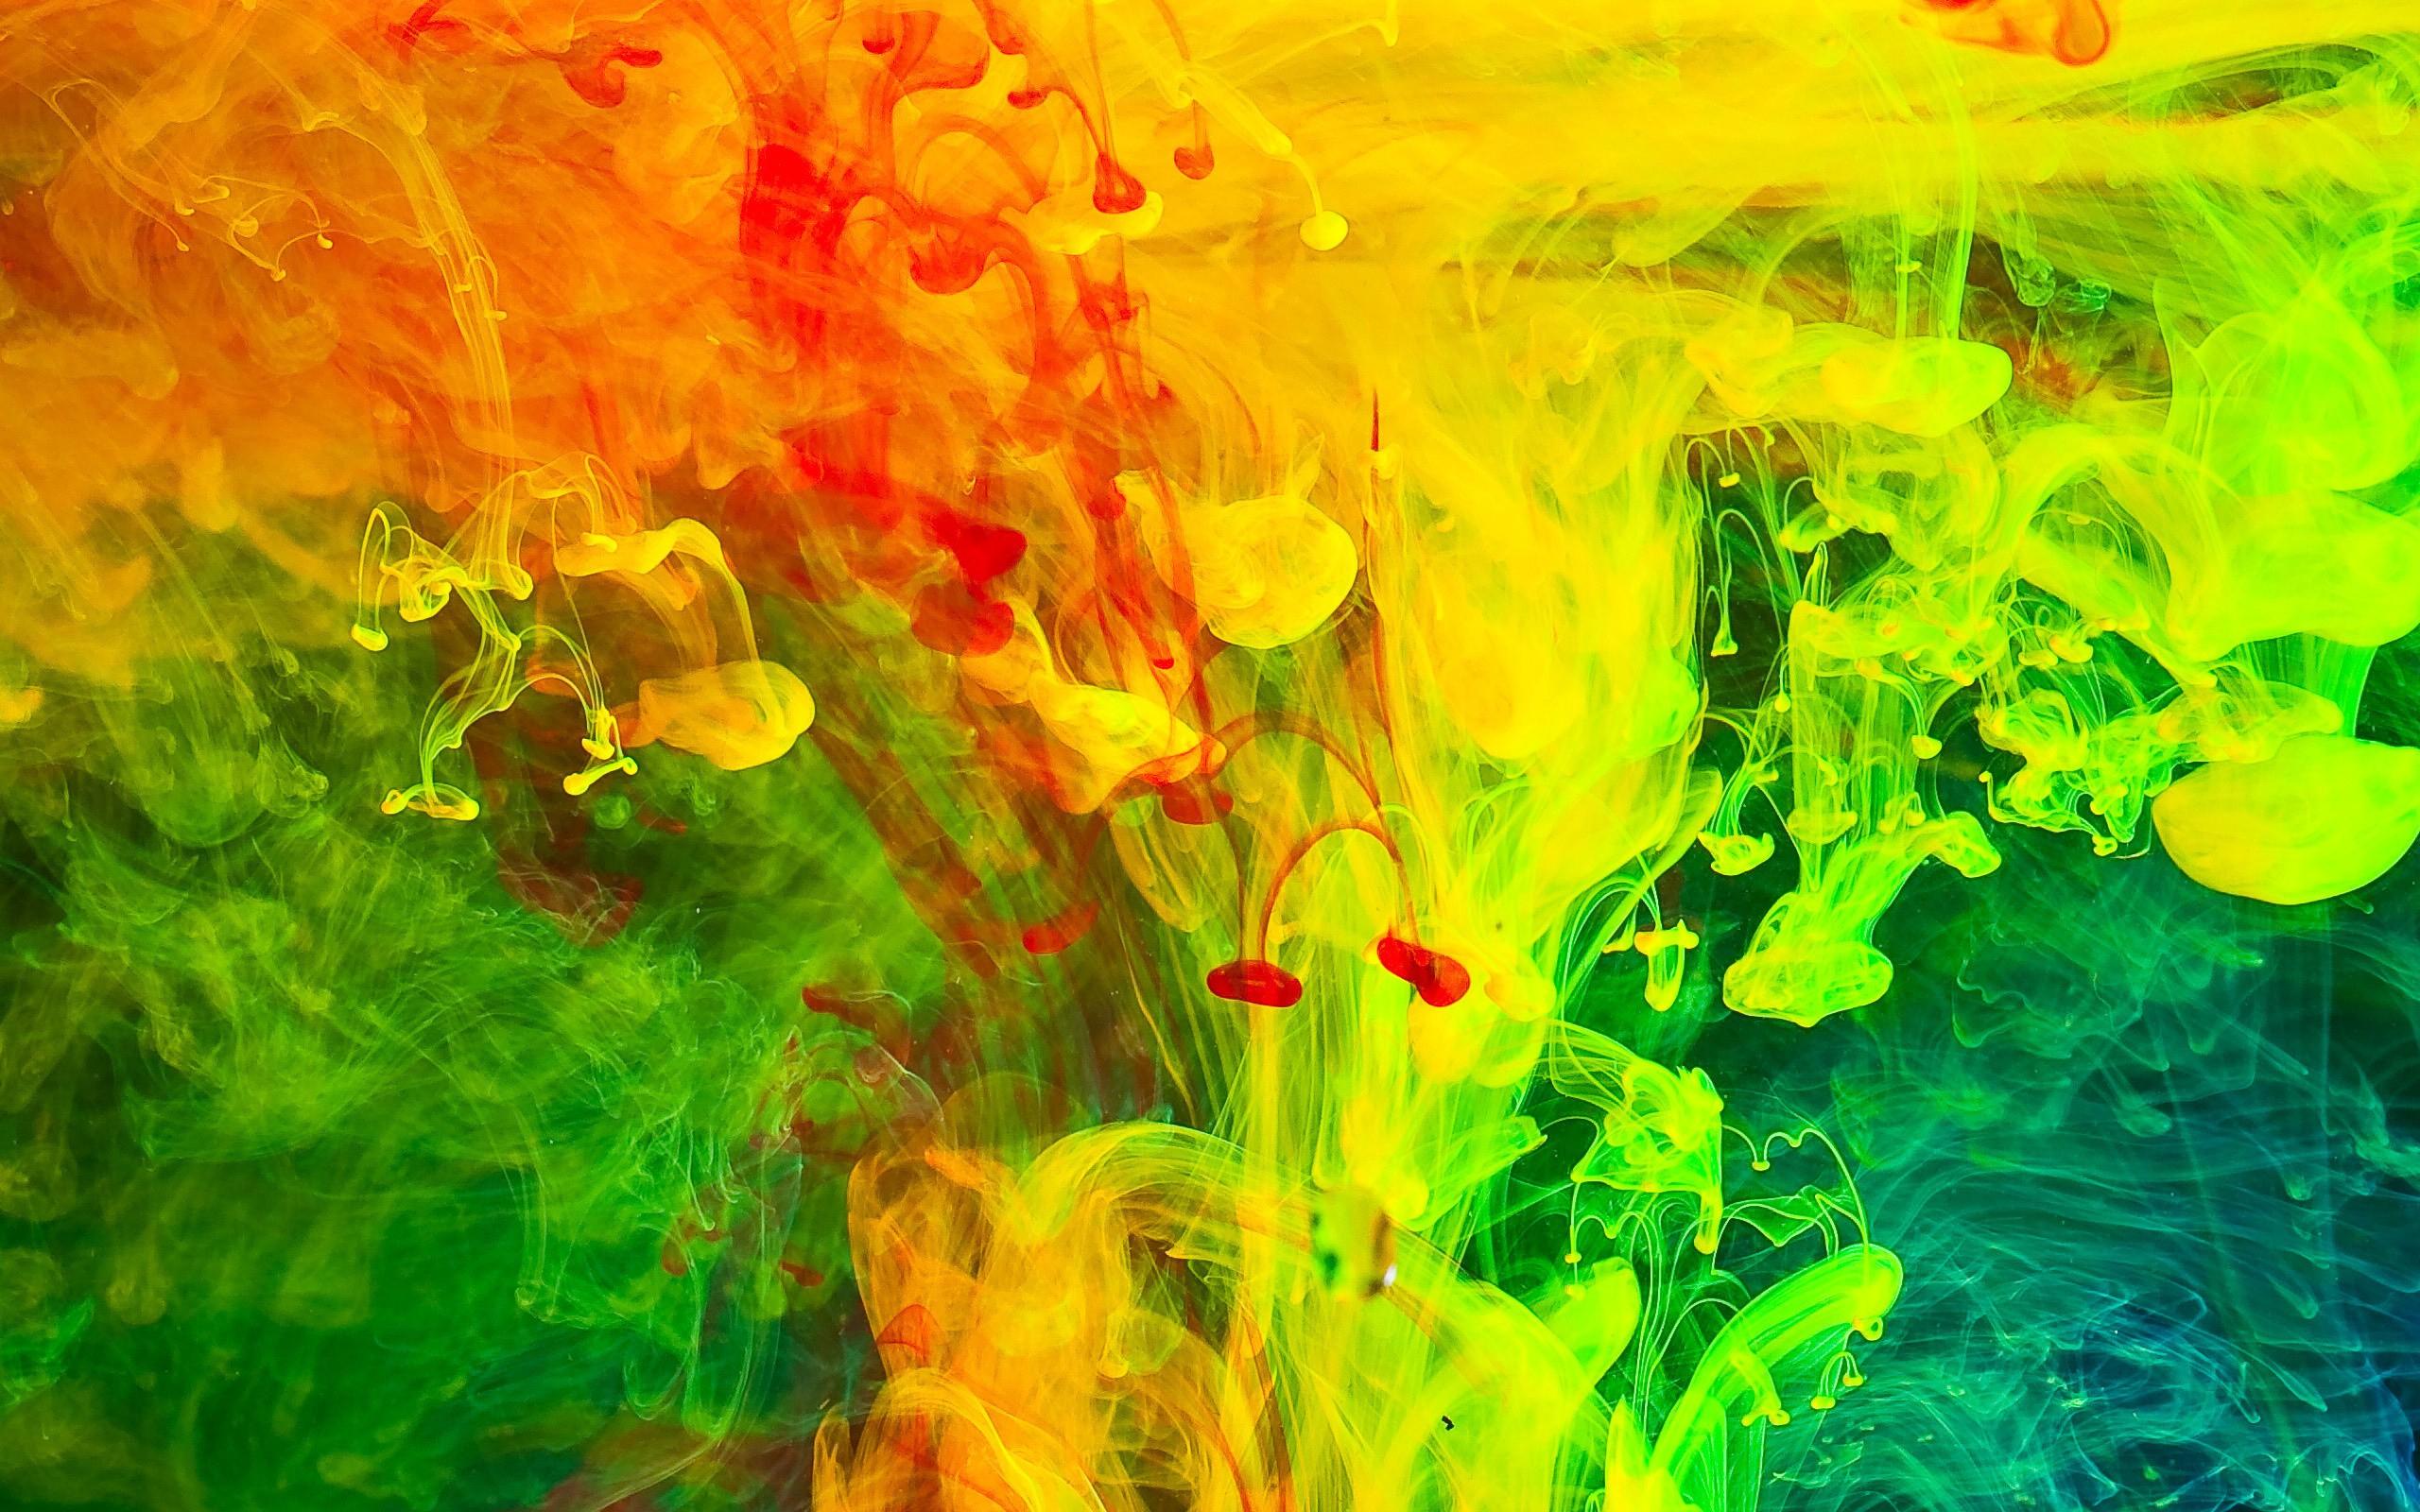 Wallpaper Sunlight Colorful Abstract Grass Artwork